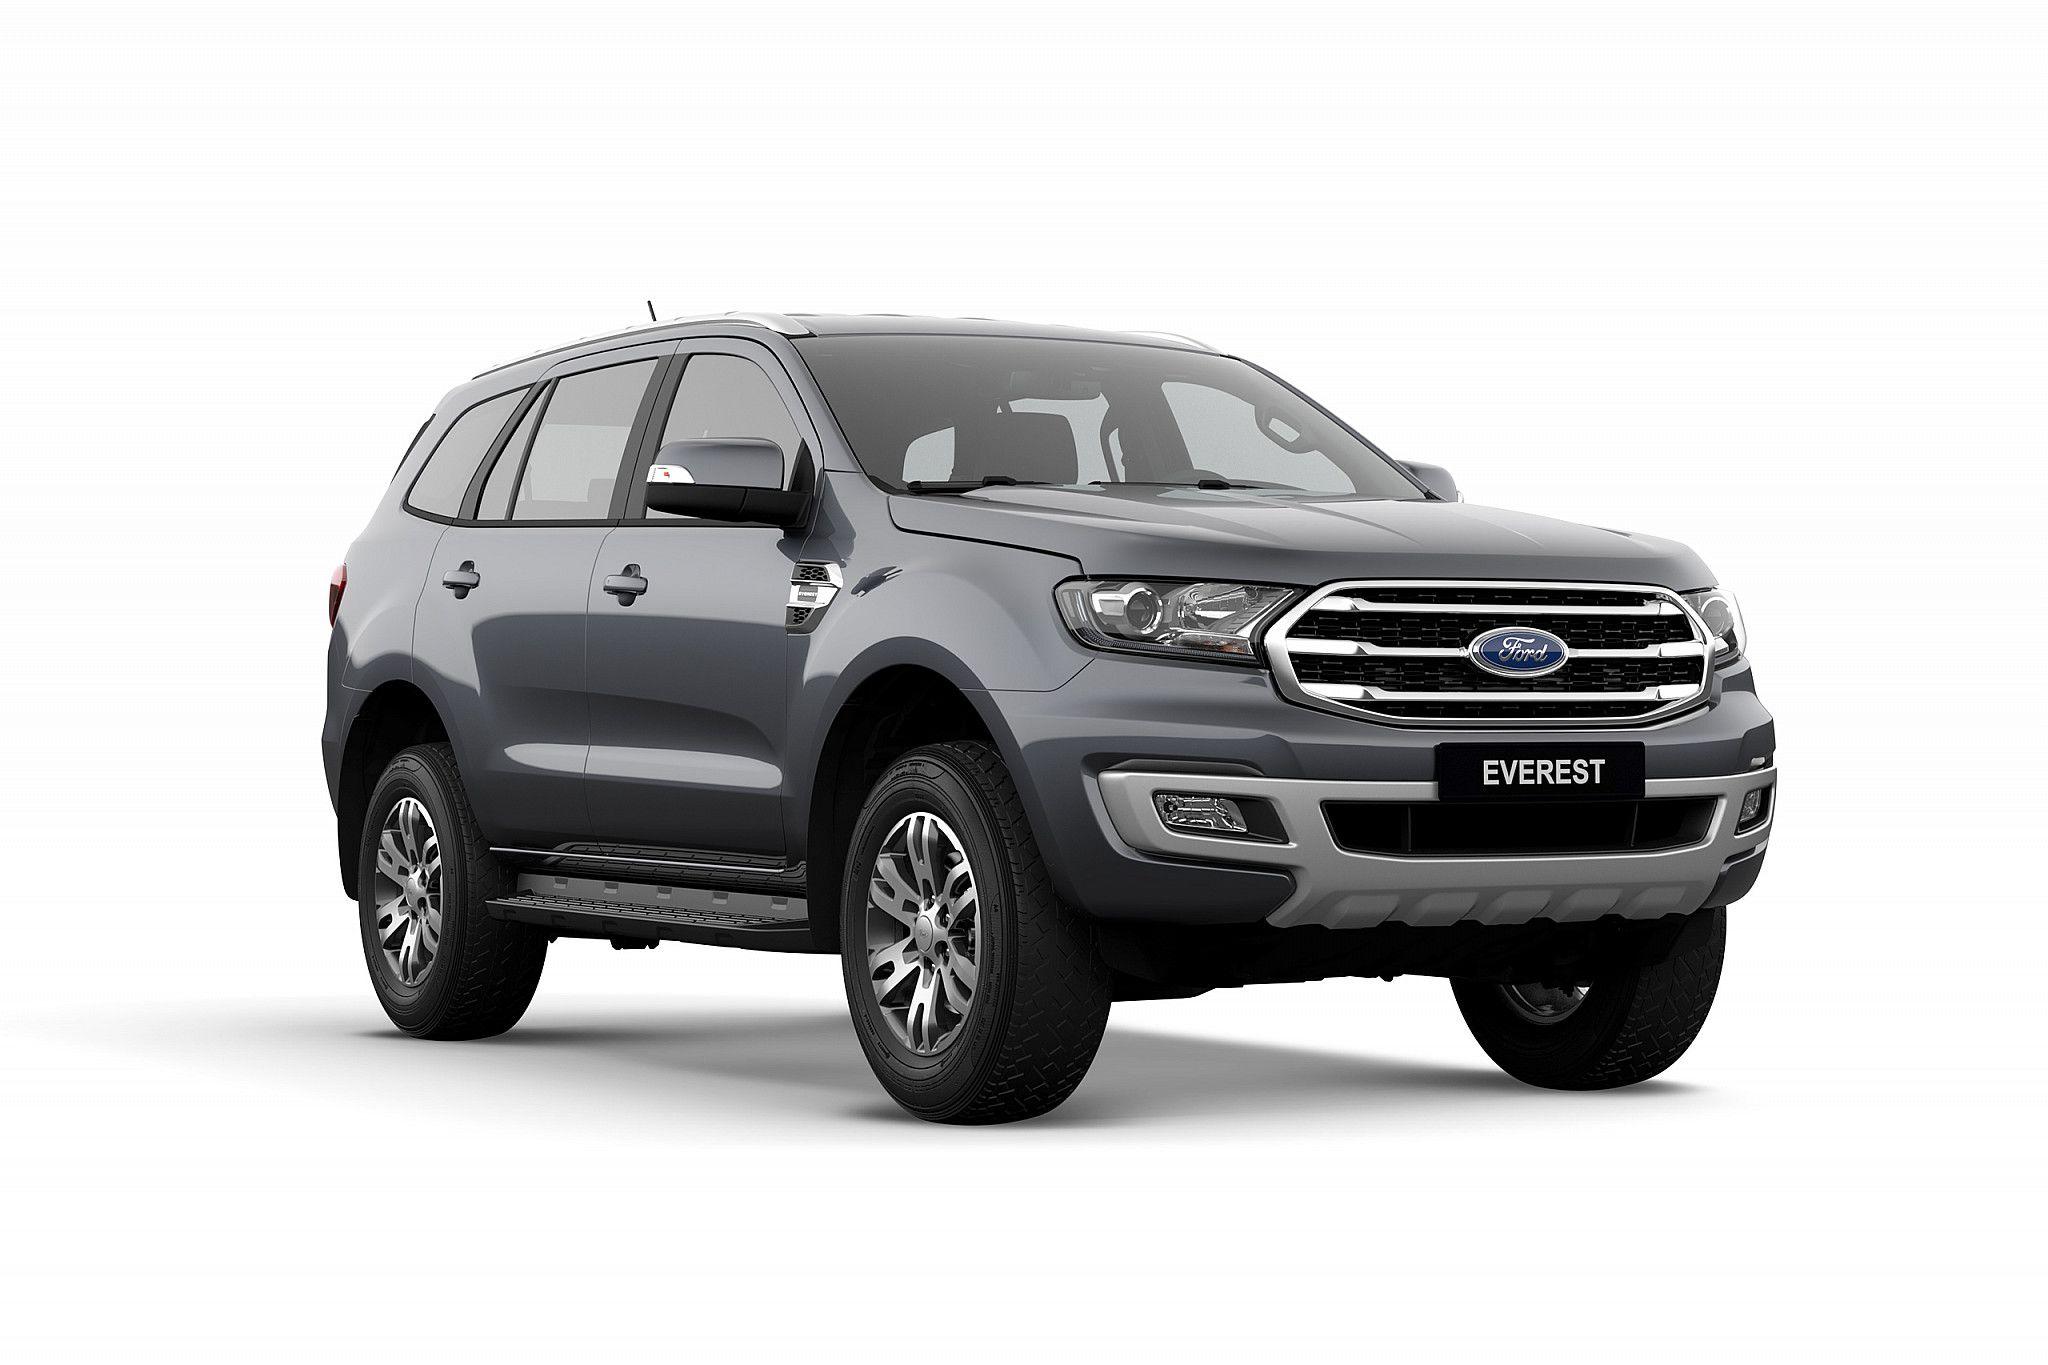 Mundo Quatro Rodas Ford 2020 Everest Gets Trend Variant Again But W In 2020 Ford 2020 Ford Car Ins